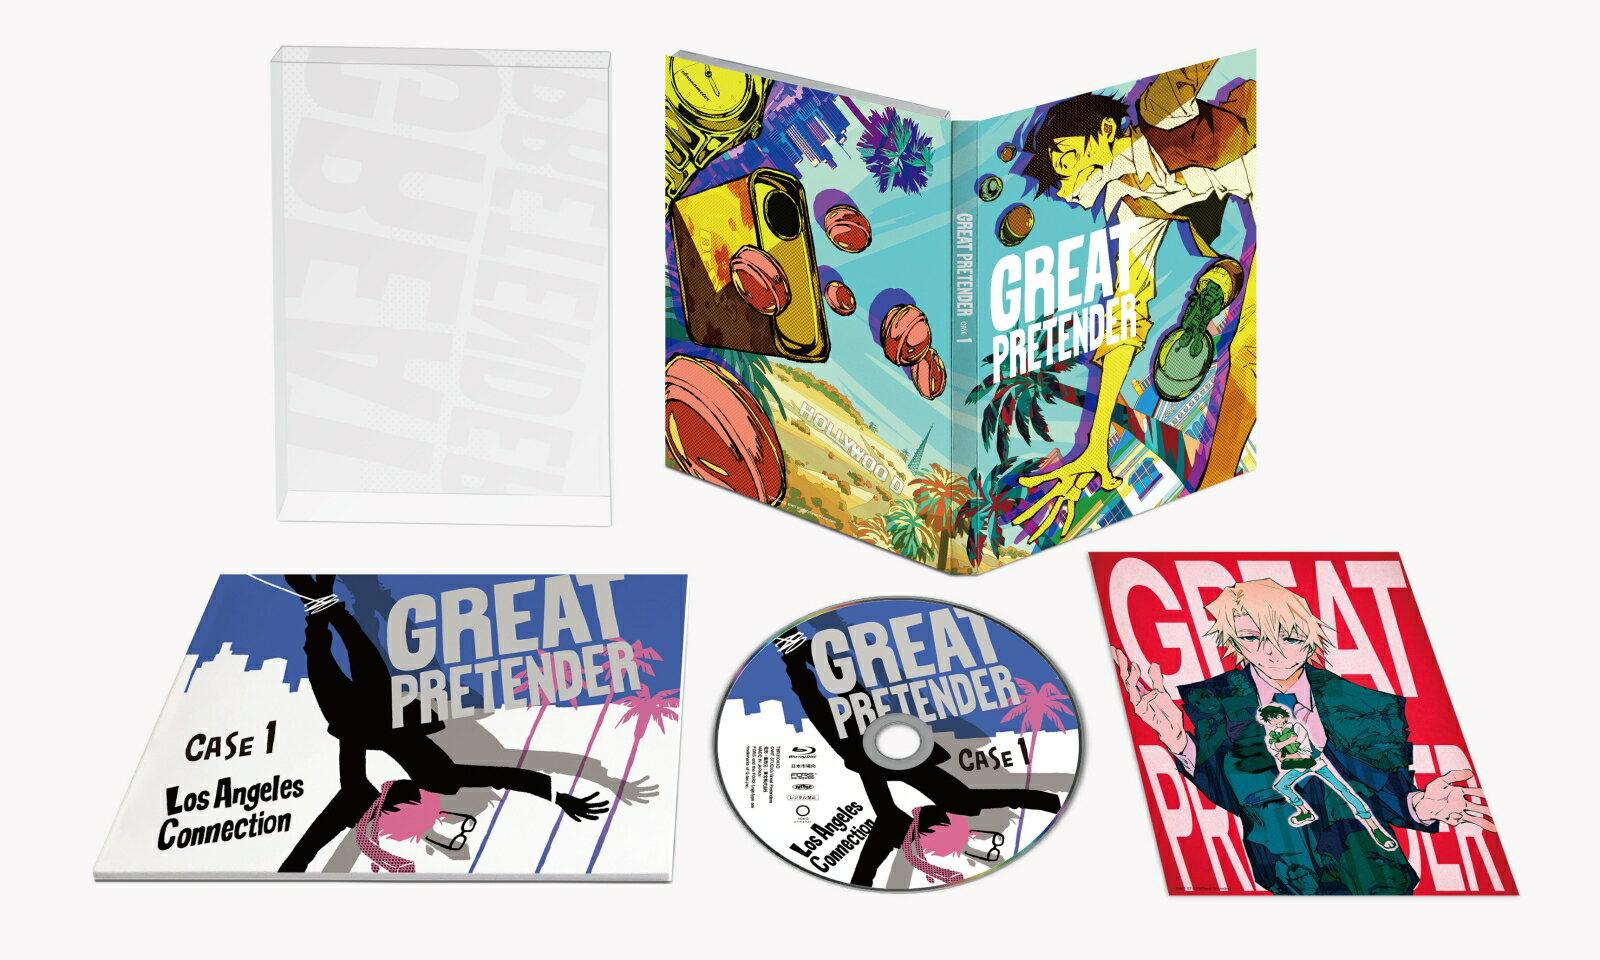 「GREAT PRETENDER」CASE 1 ロサンゼルス・コネクション【Blu-ray】 [ 小林千晃 ]画像